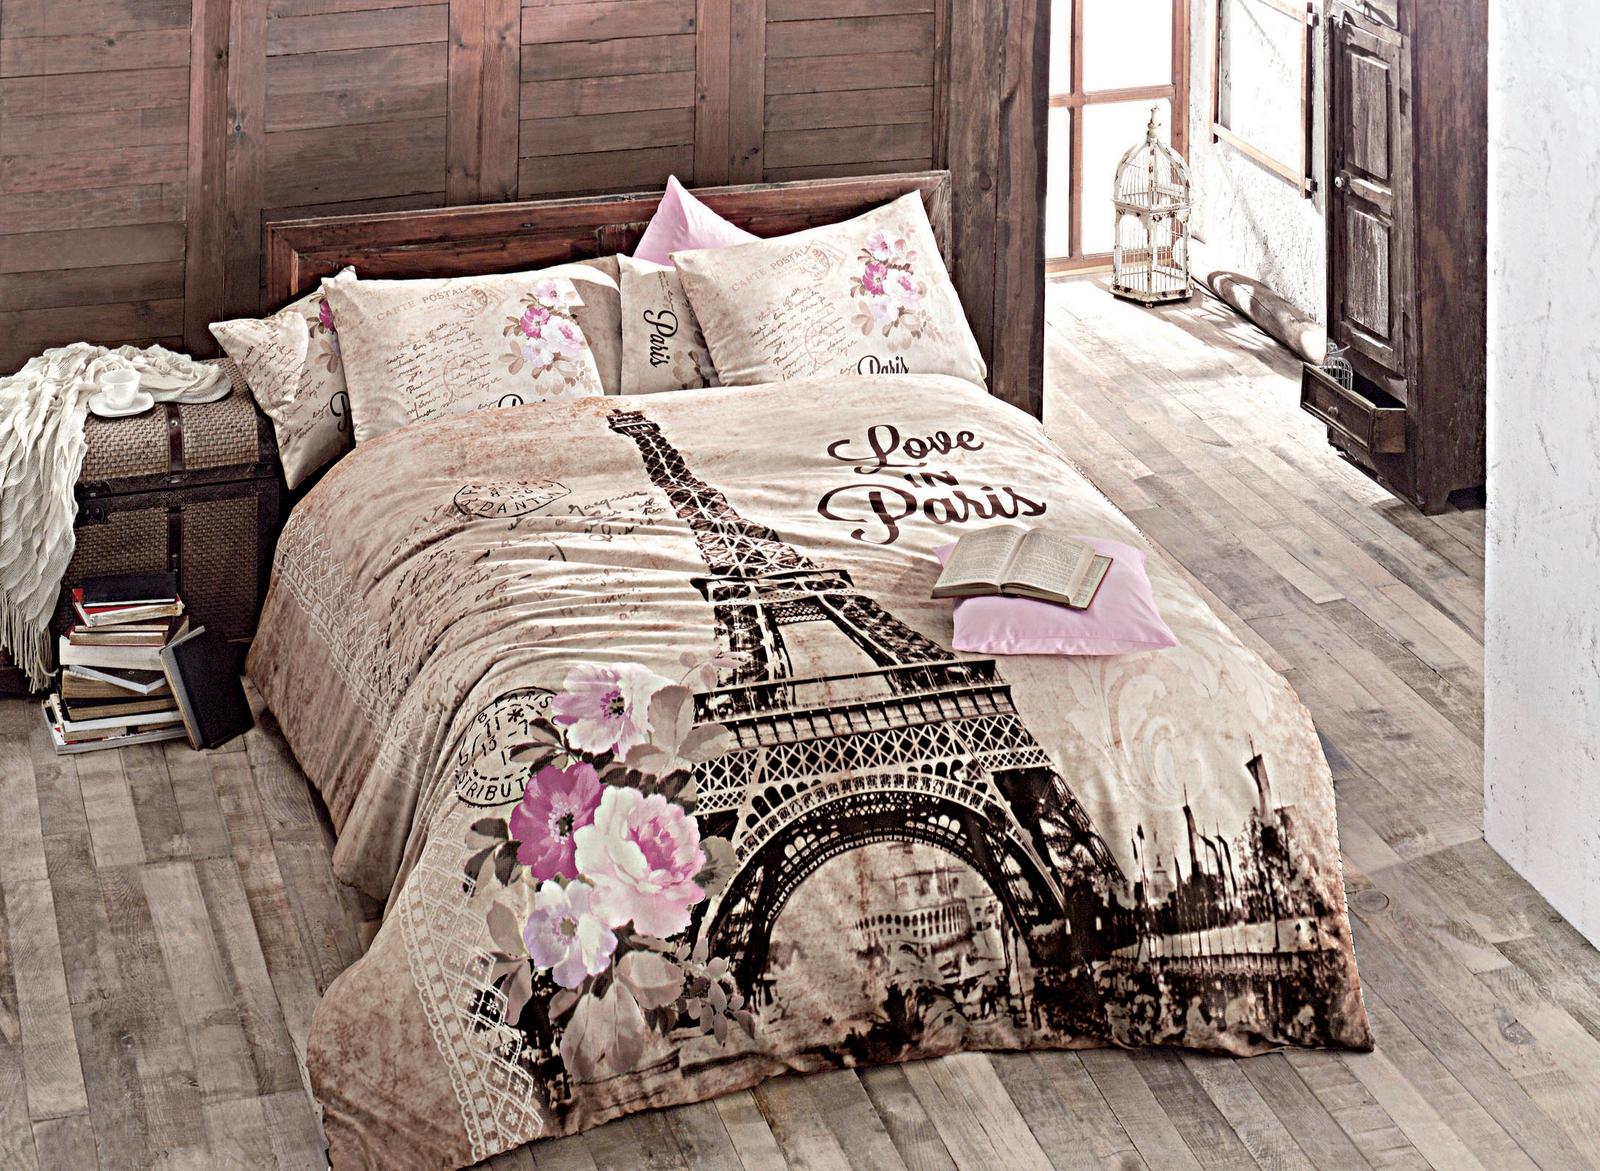 цена на Комплект белья Issimo Home Paris, евро, наволочки 50x70, цвет: бежевый